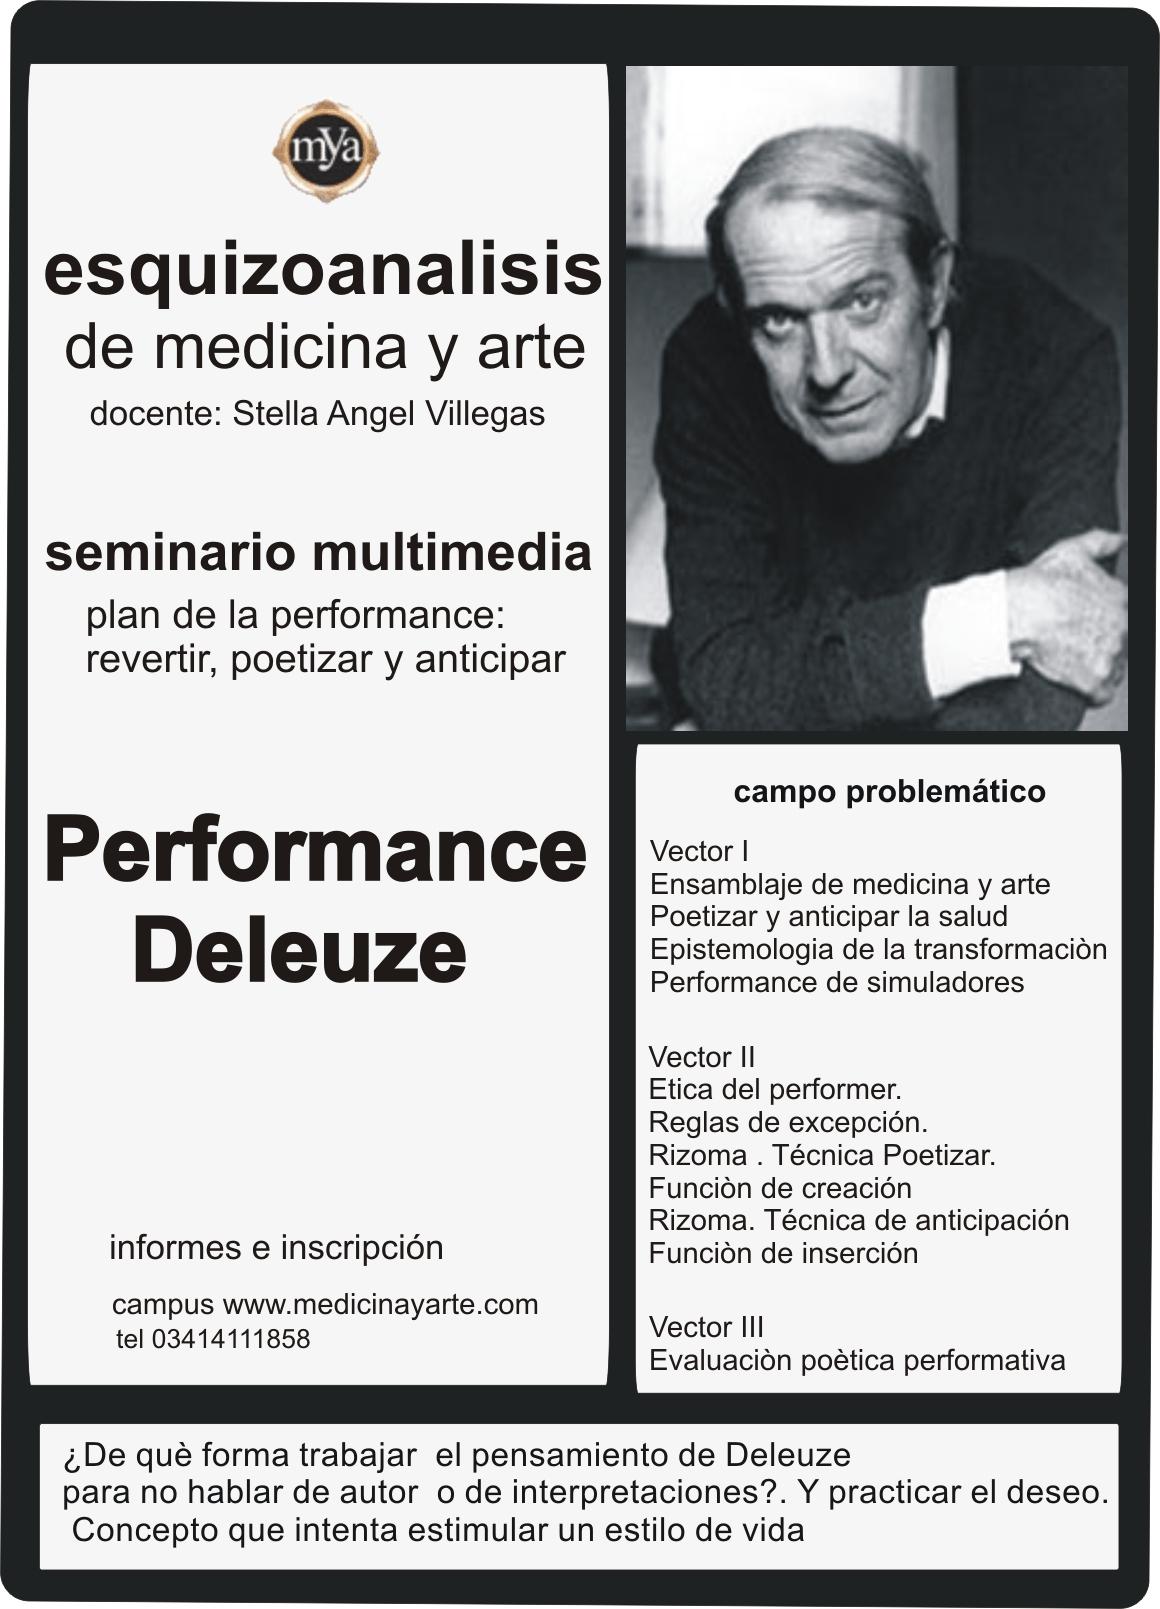 http://www.medicinayarte.com/img/afiche_performance_deleuze_agosto_2013_2.jpg